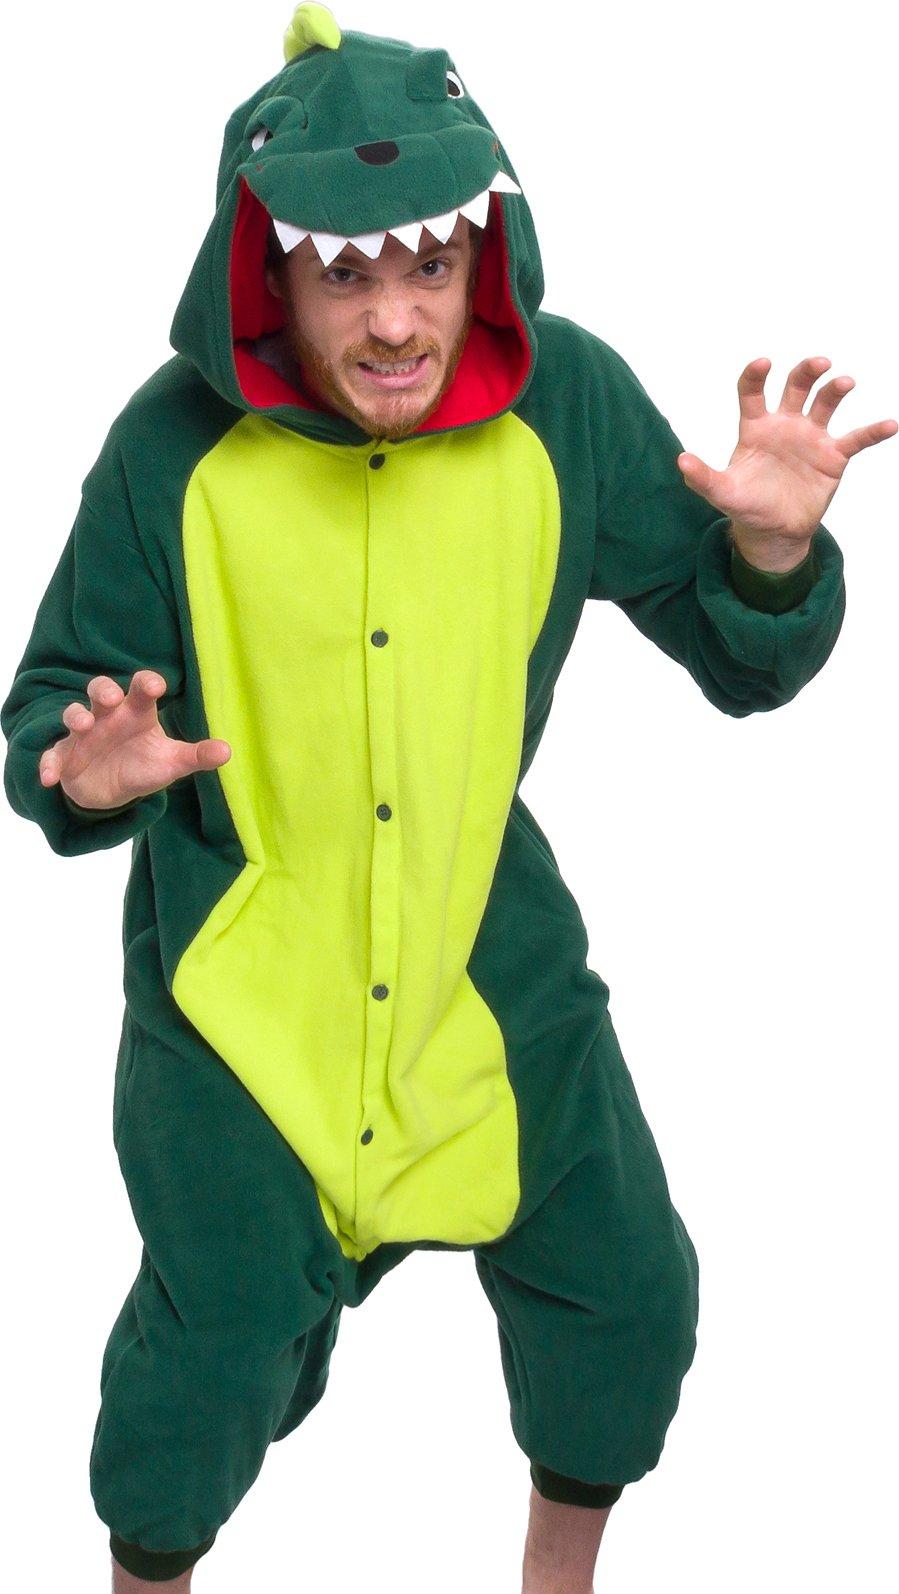 Silver Lilly Adult Pajamas - One Piece Cosplay Animal Costume (Dinosaur, L)